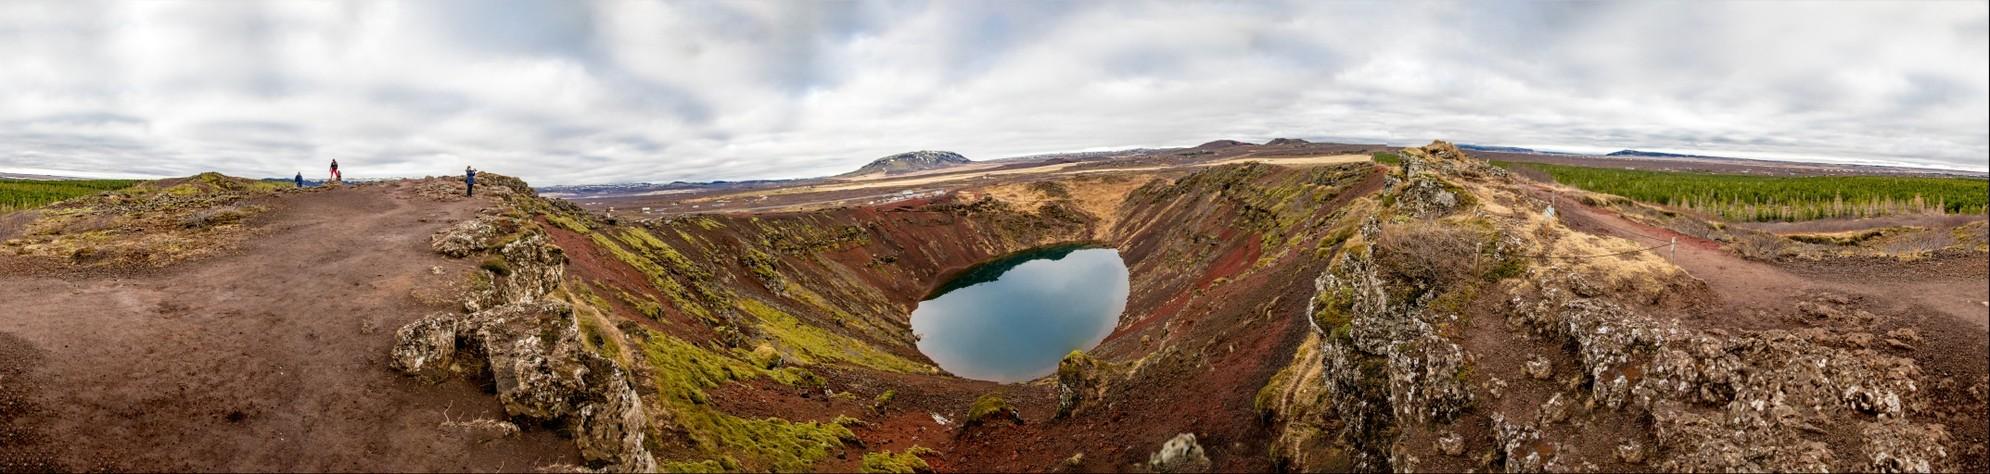 Iceland - Feb 2017 - Panorama 16